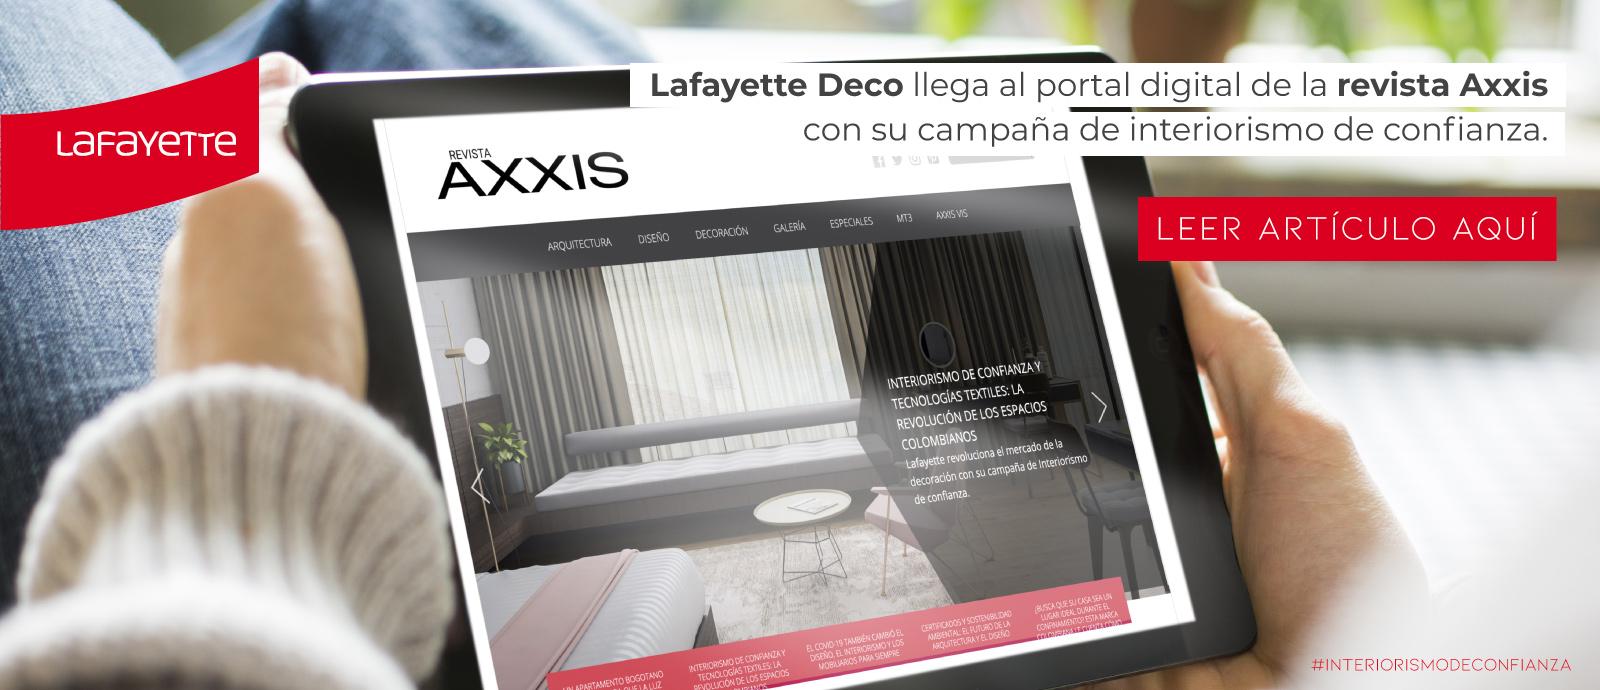 Revista-axxis-interiorismo-de-confianza